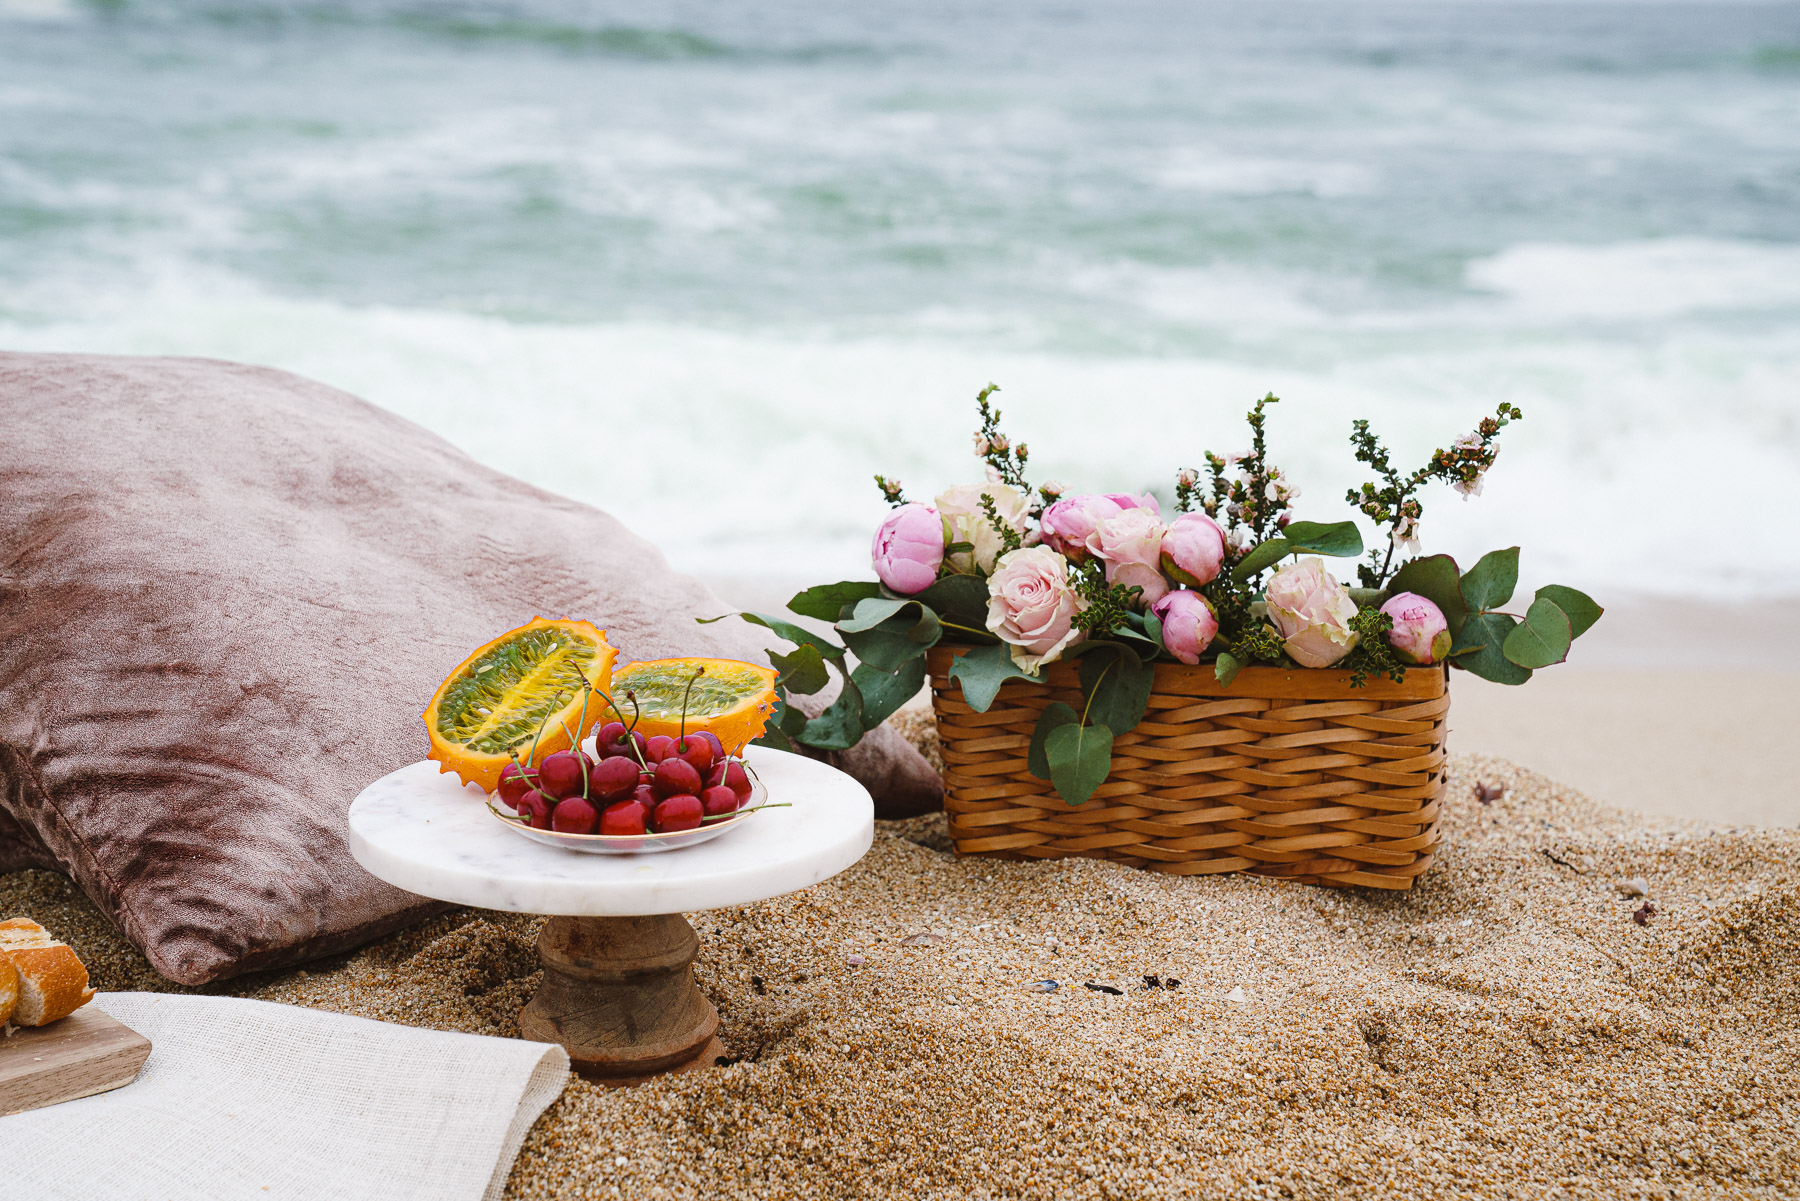 robert-mondavi-beach-picnic-2.jpg